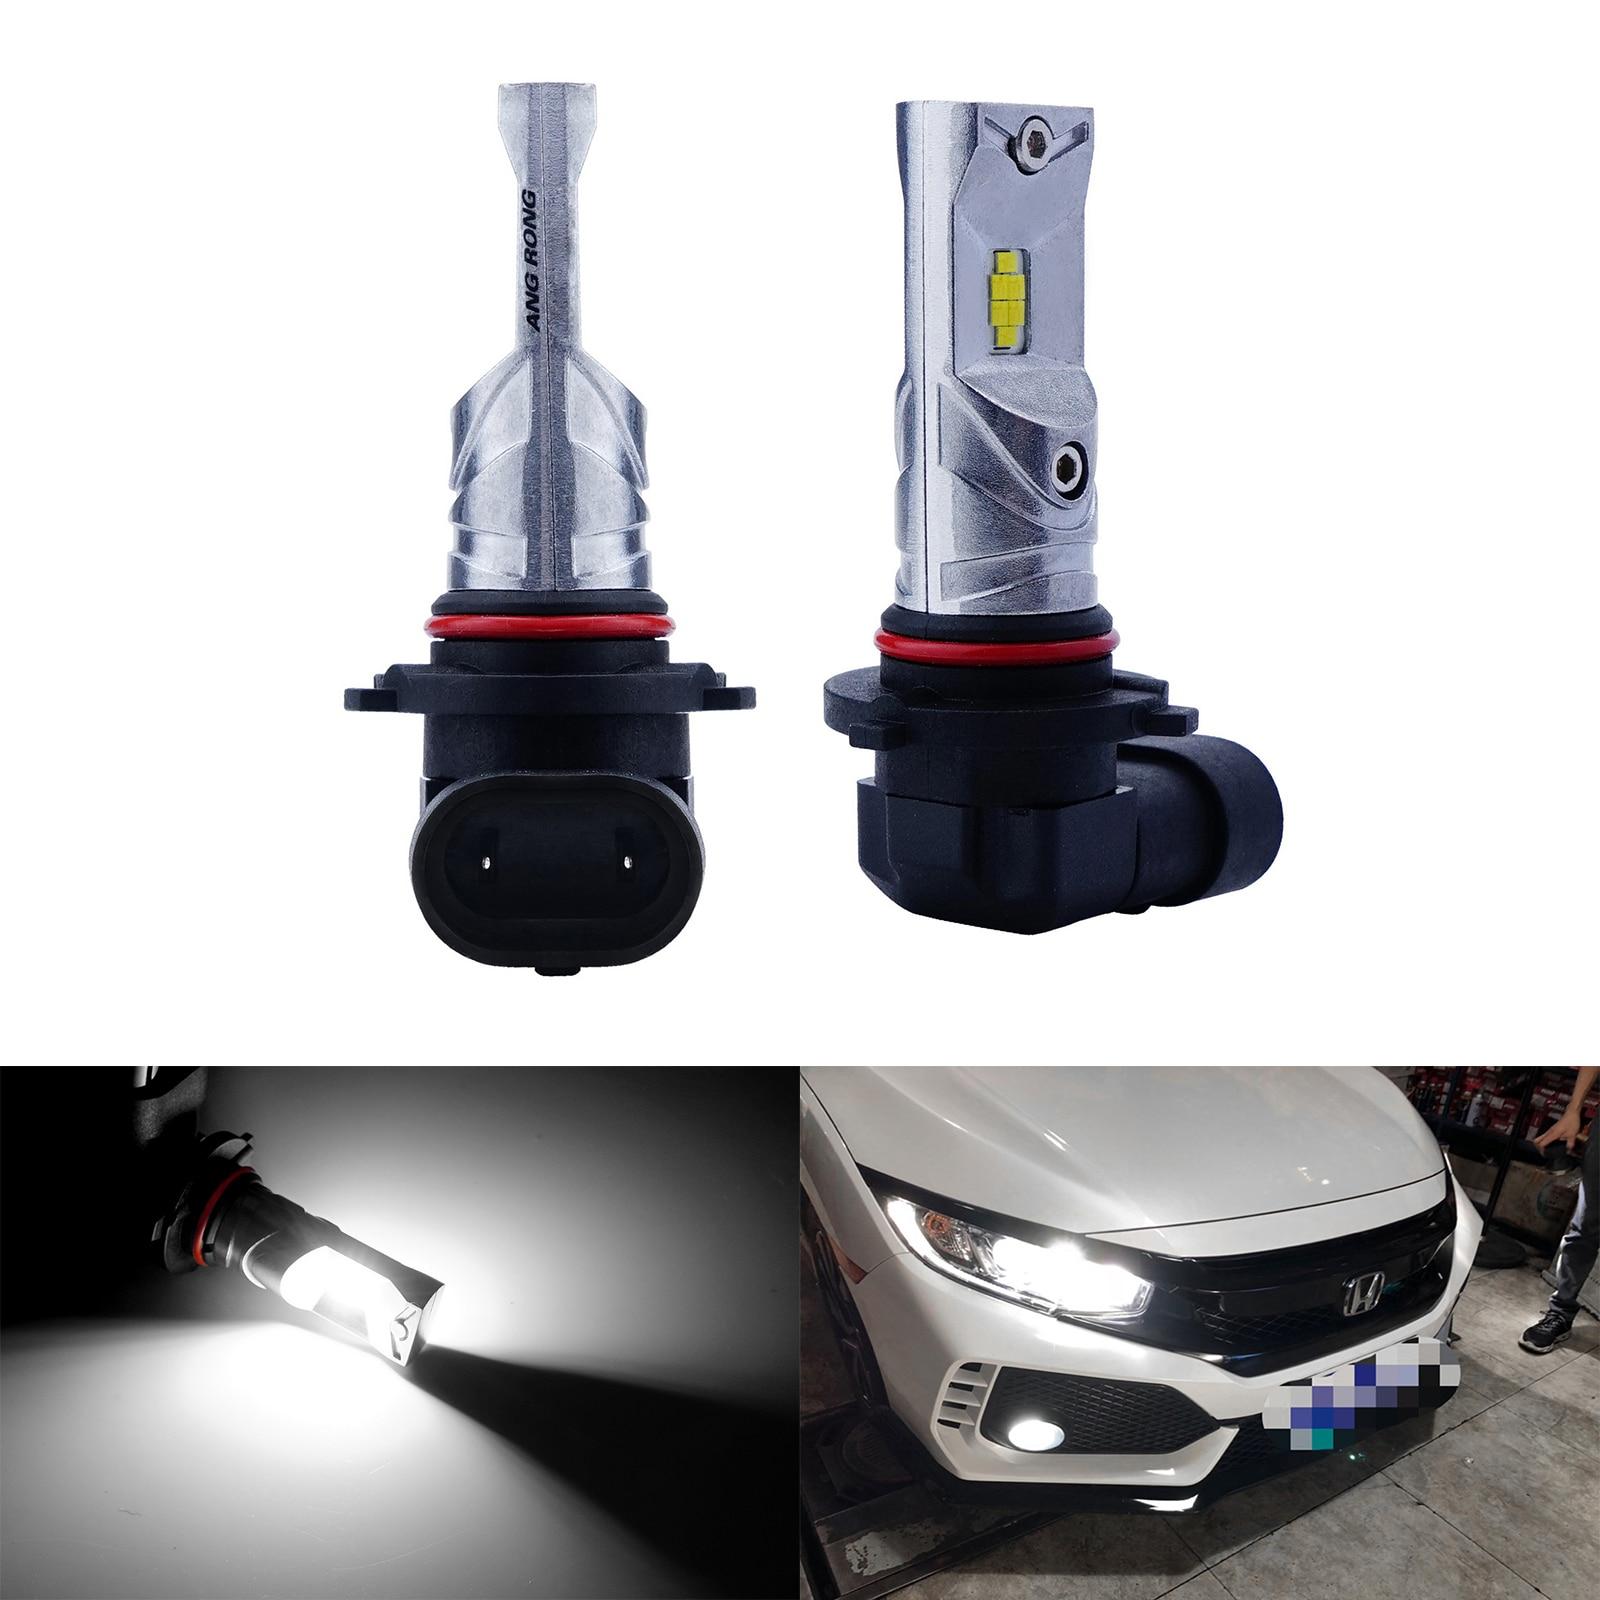 2x H7 Xenon Bulbs 55w 12v White To Fit Headlight Renault Clio MK3 200